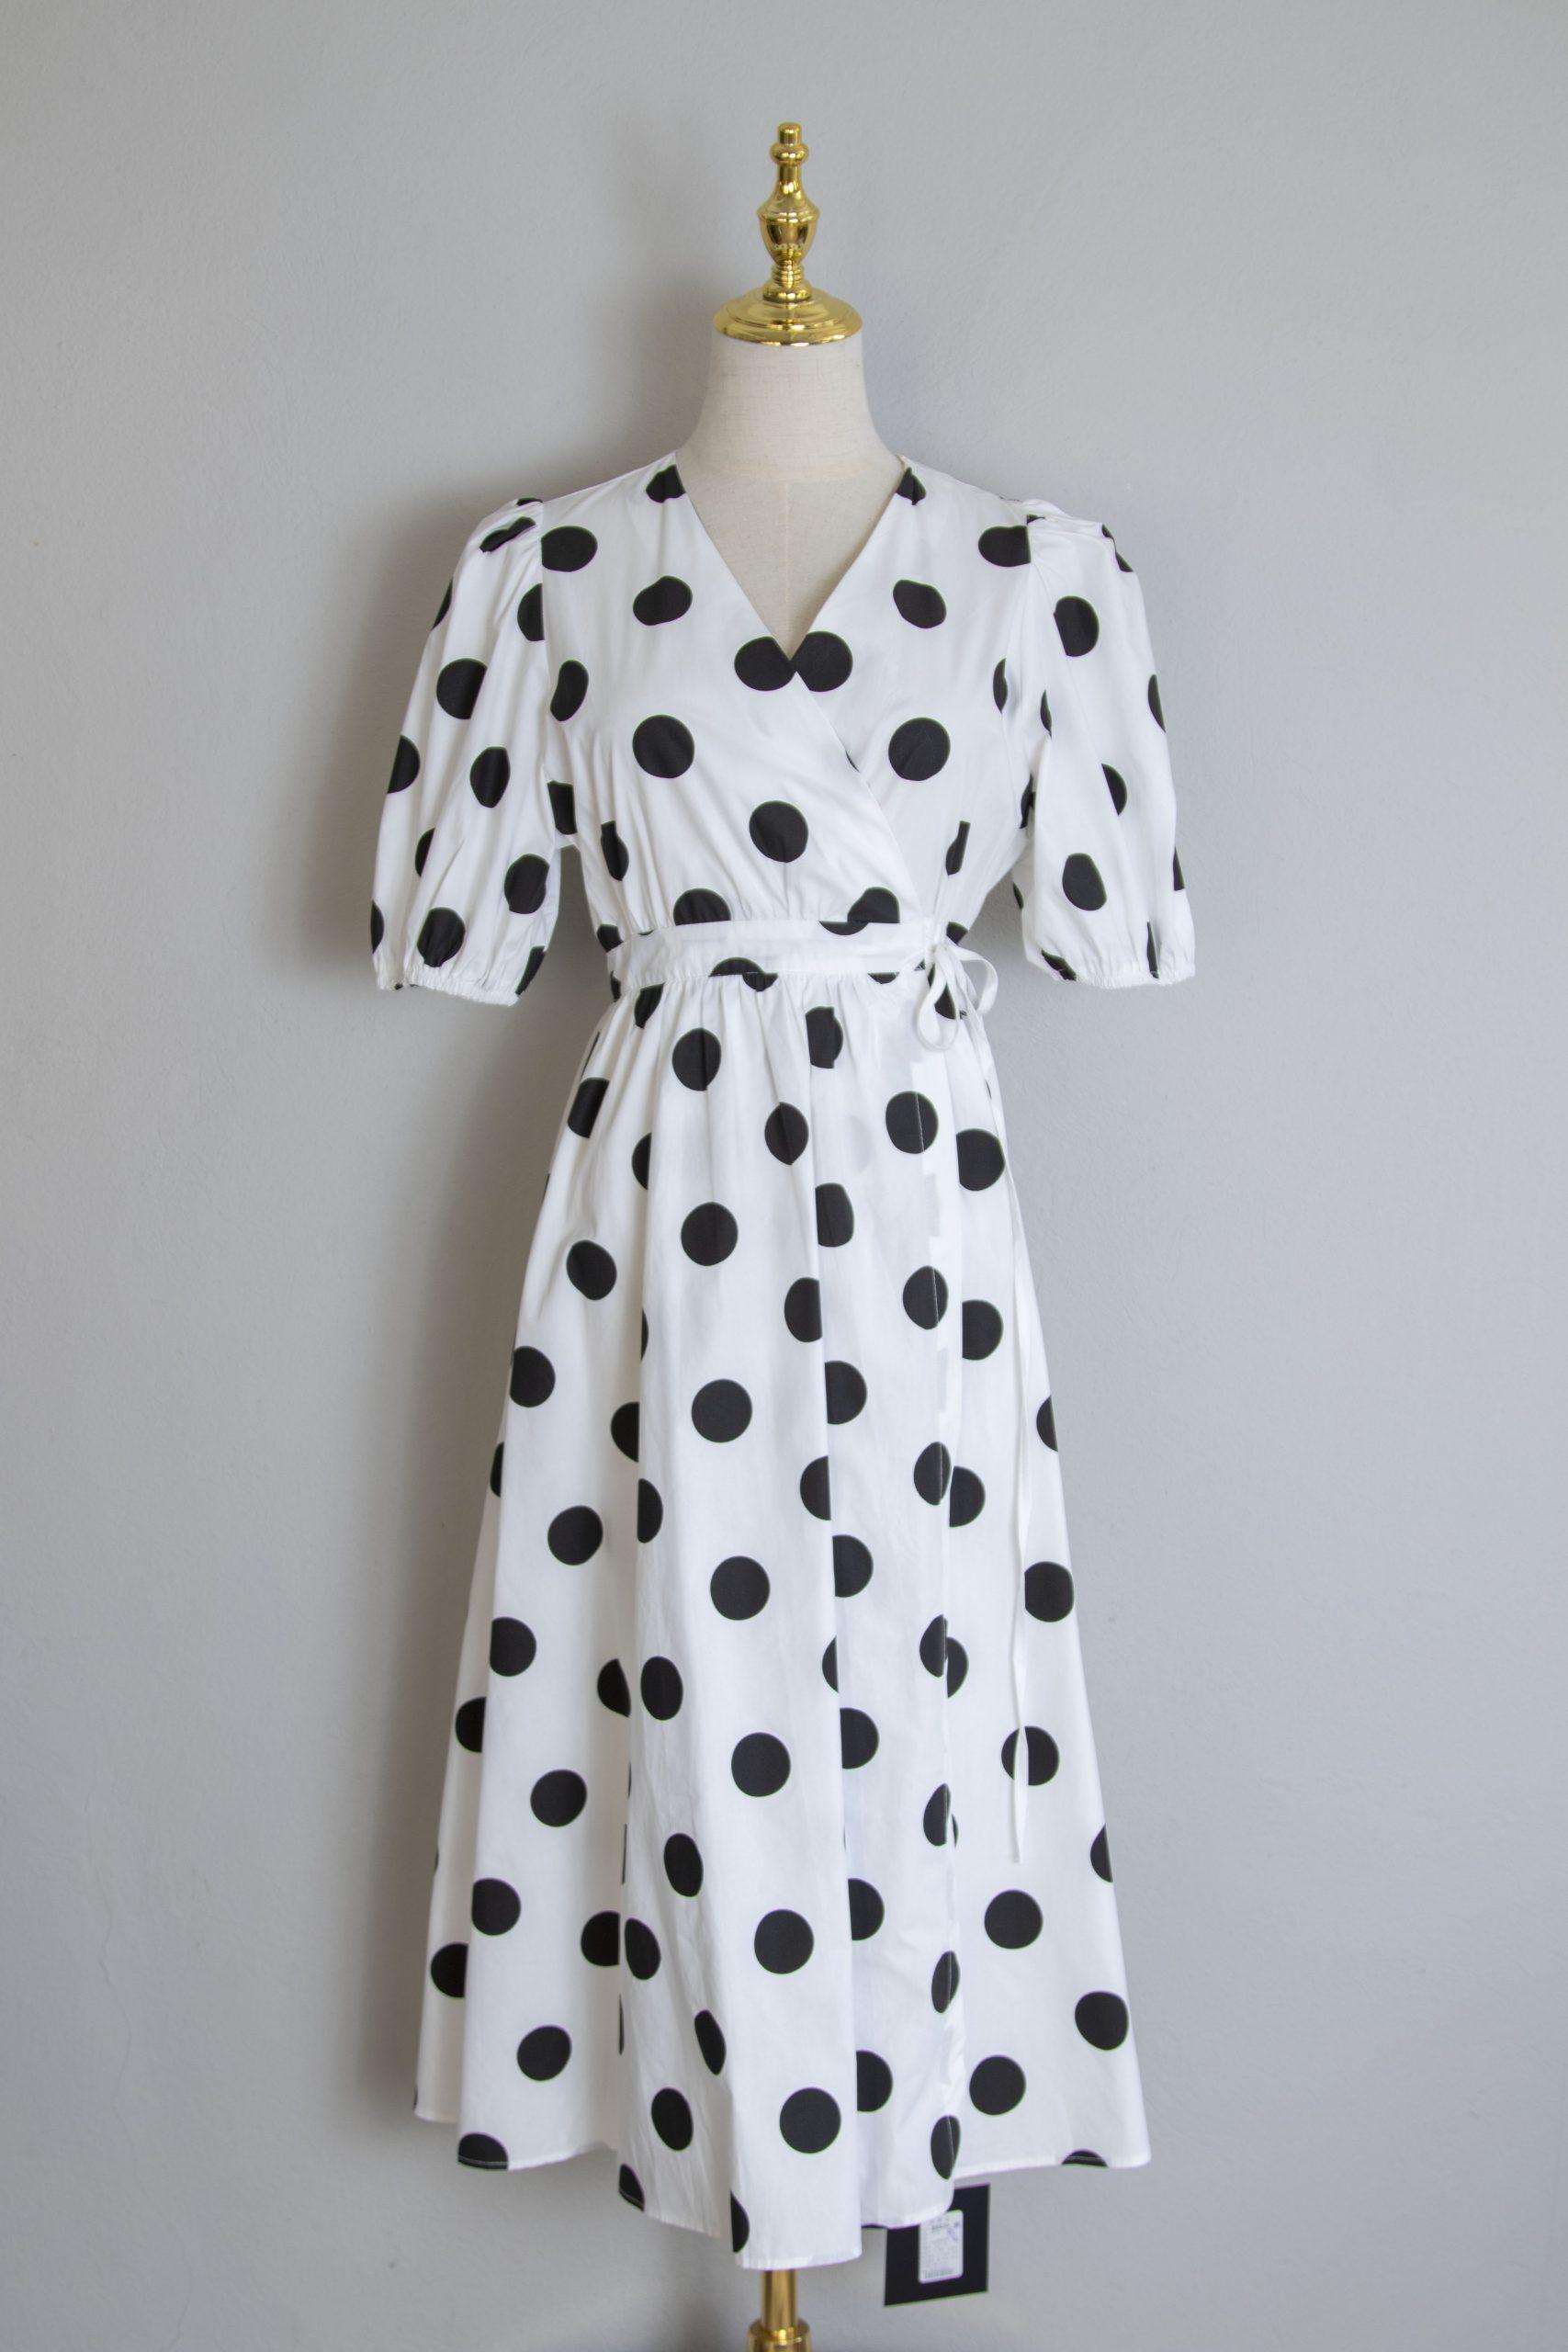 Cotton crossover dress